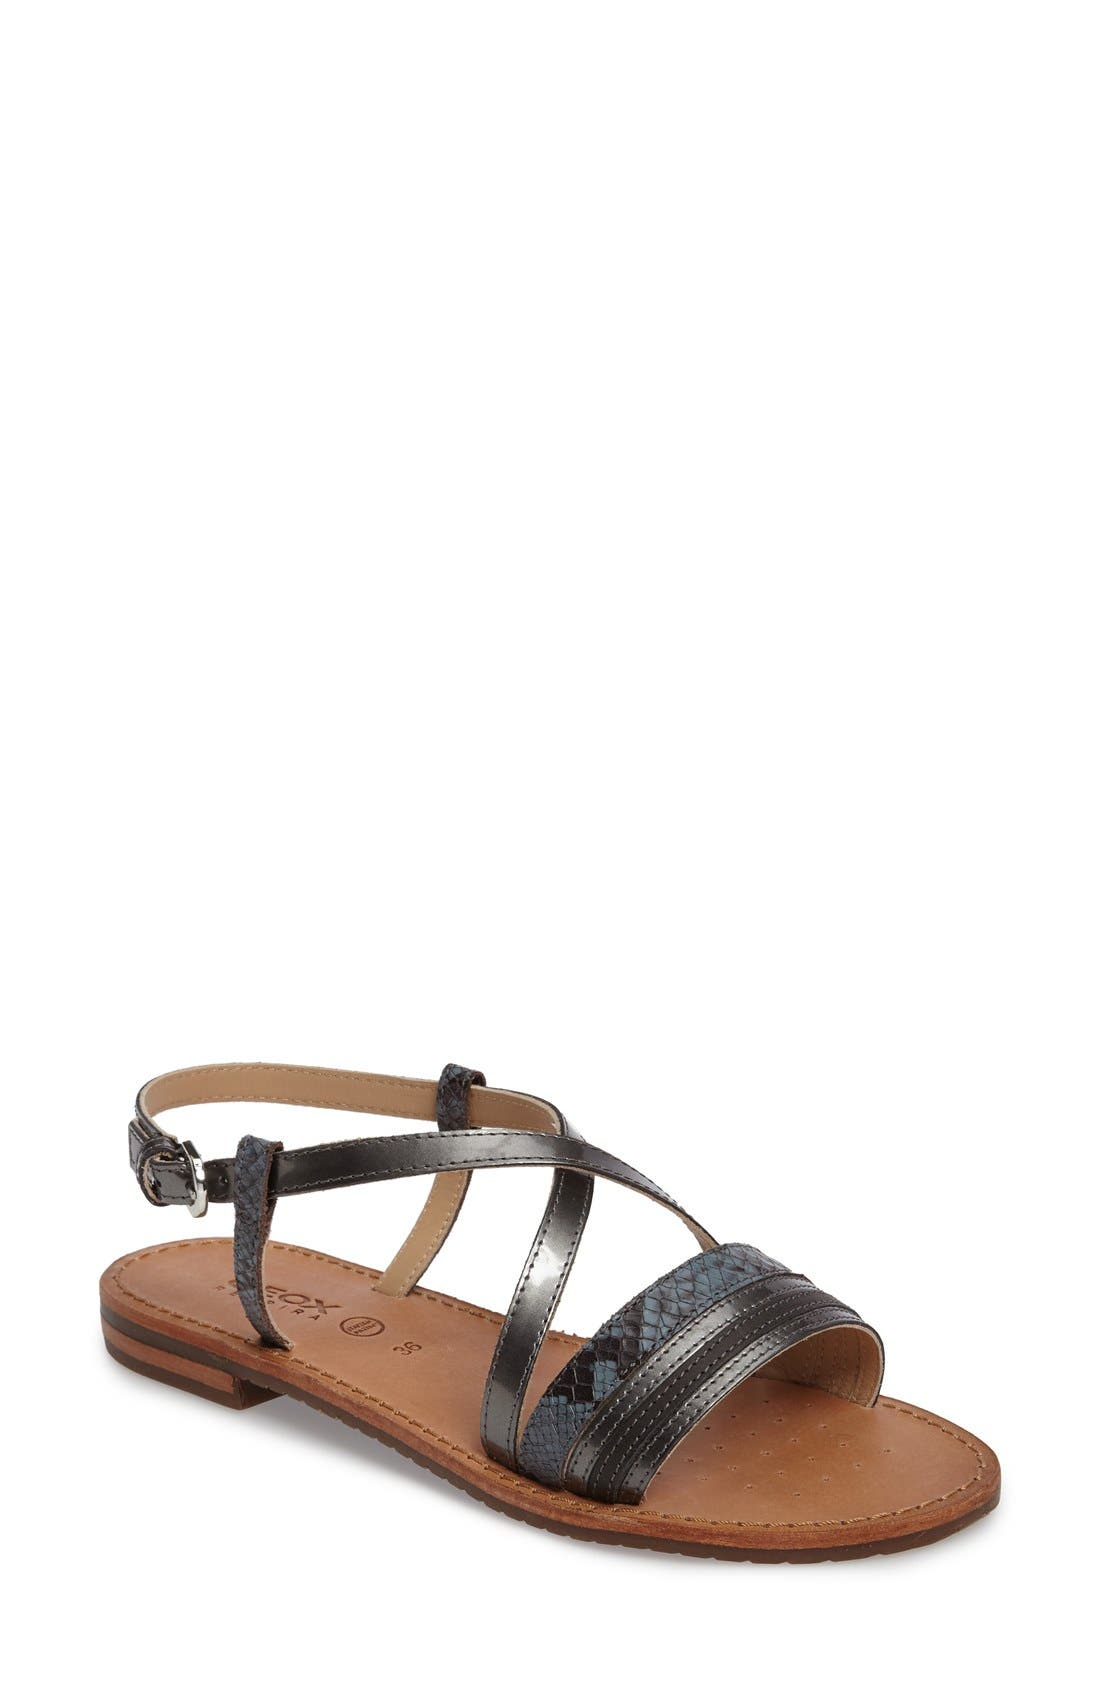 Geoz Sozy Slingback Sandal (Women)